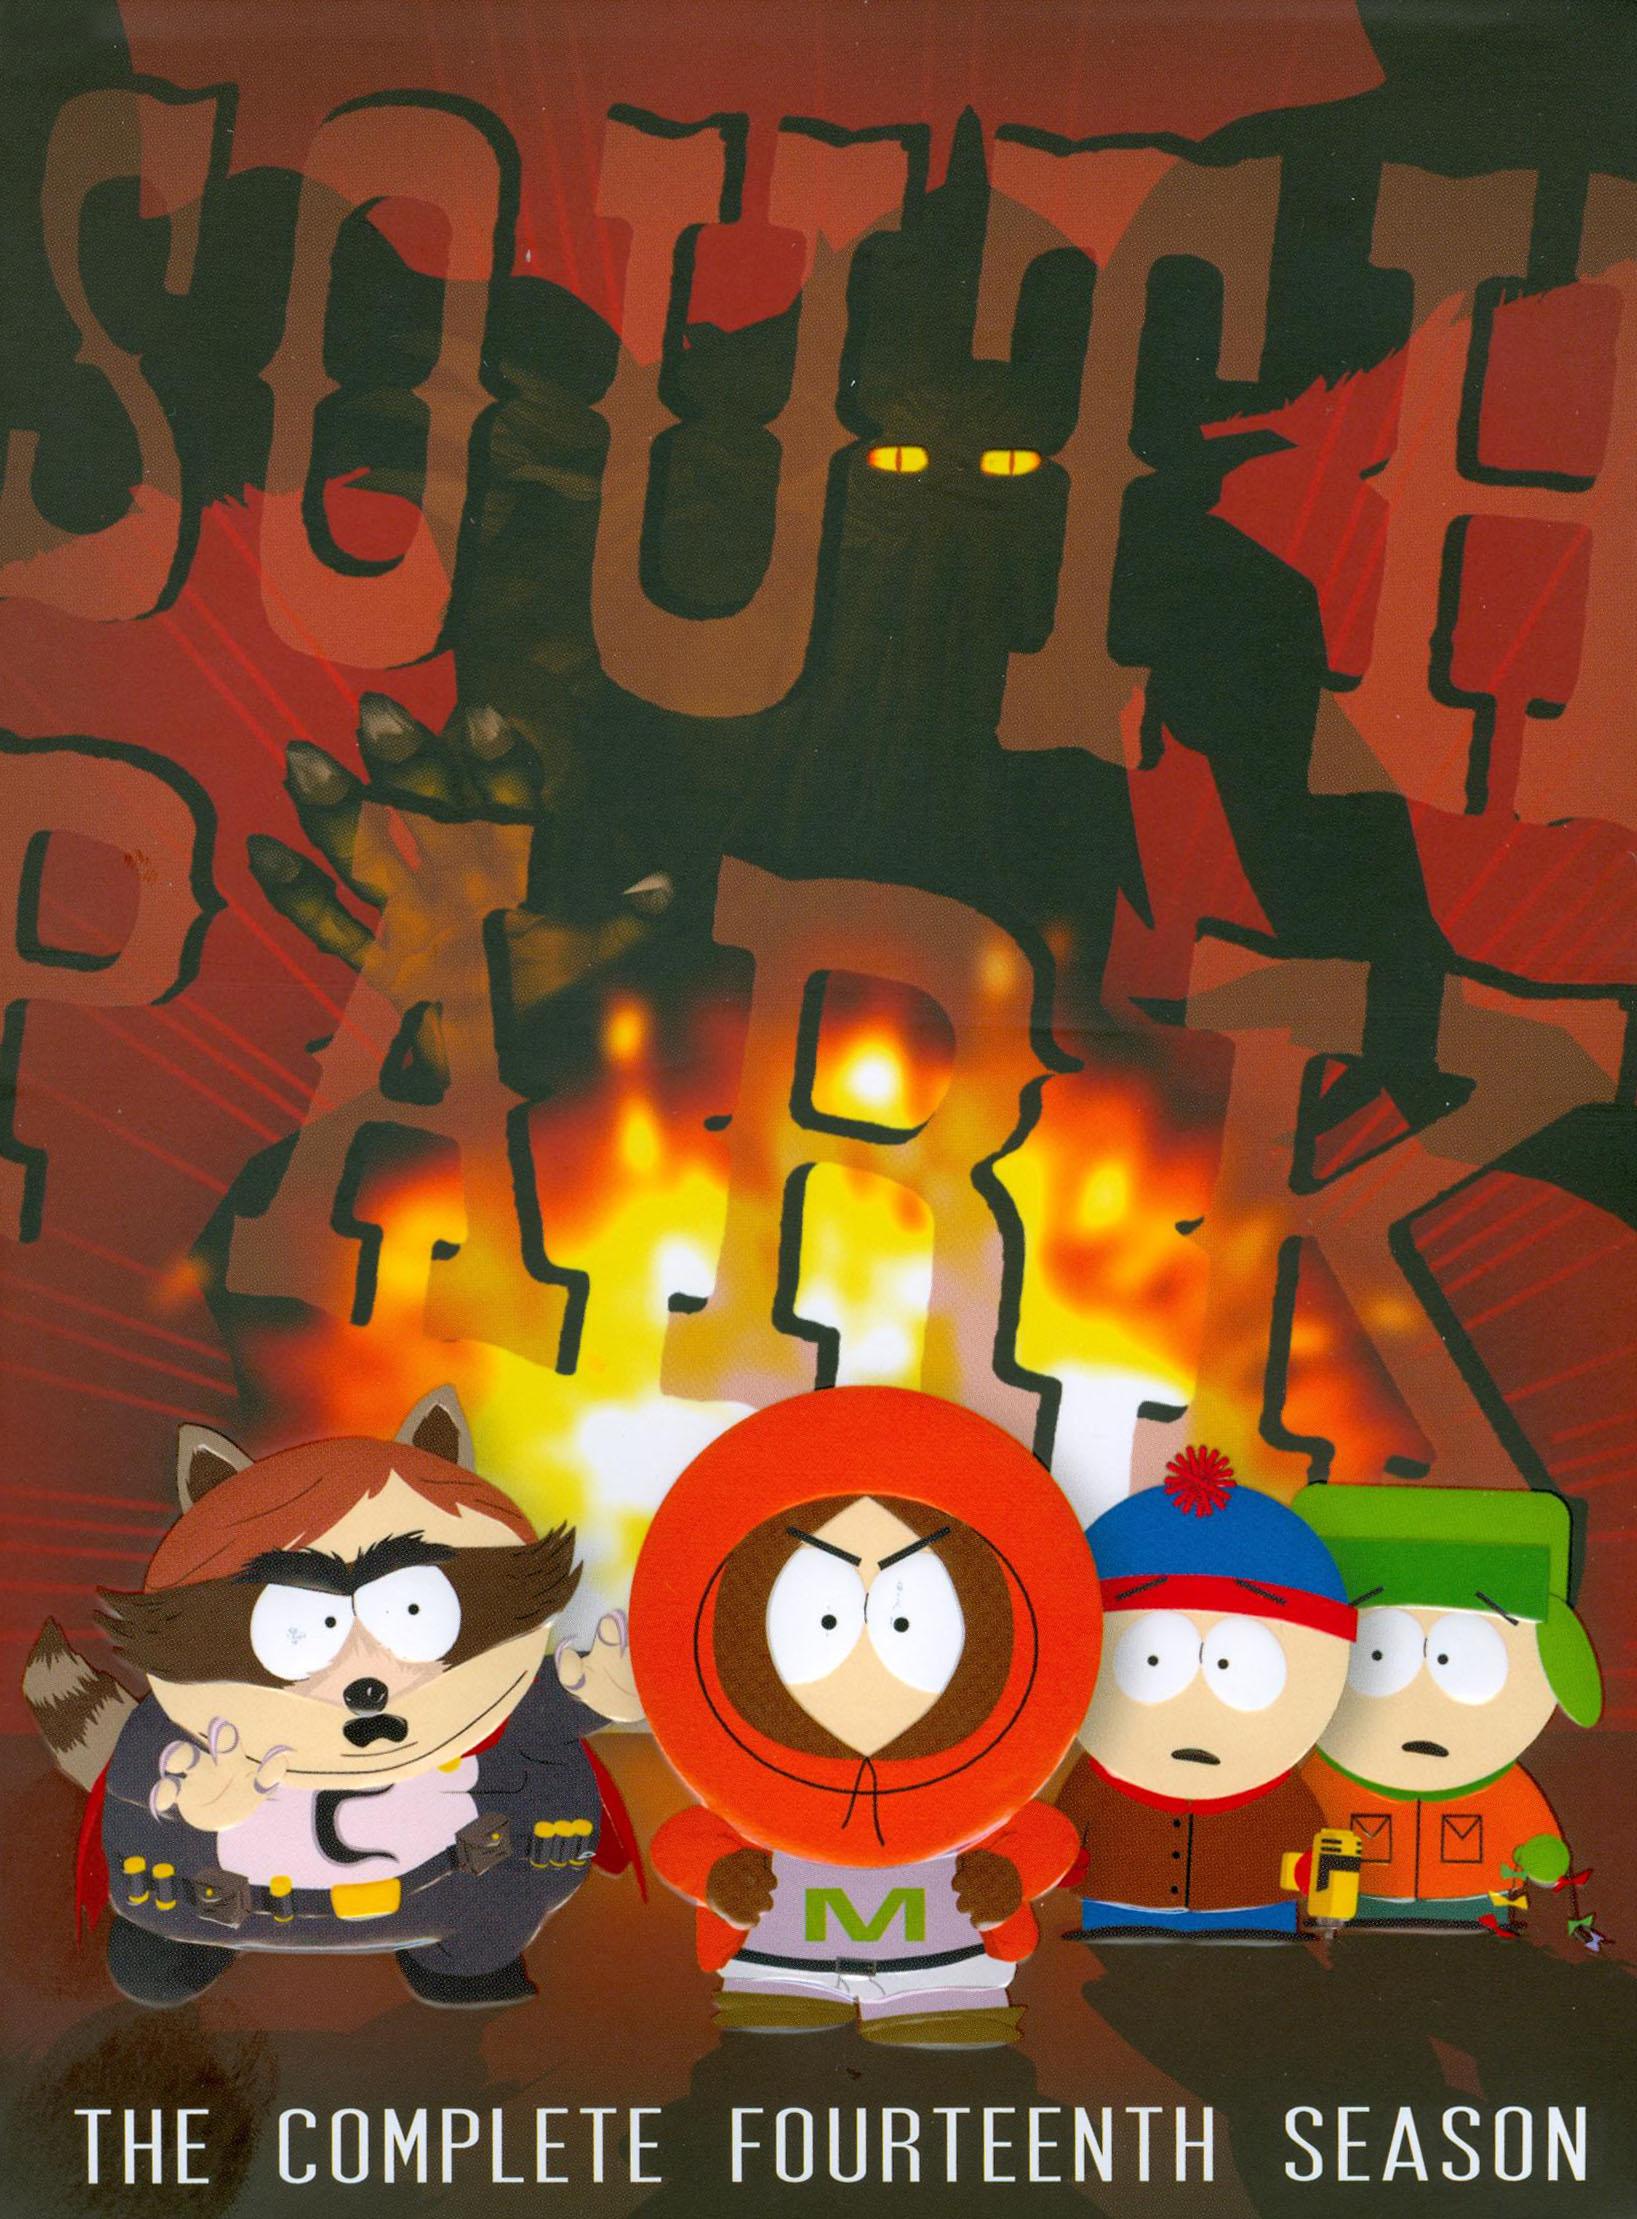 South Park: The Complete Fourteenth Season [3 Discs] (dvd) 2244087